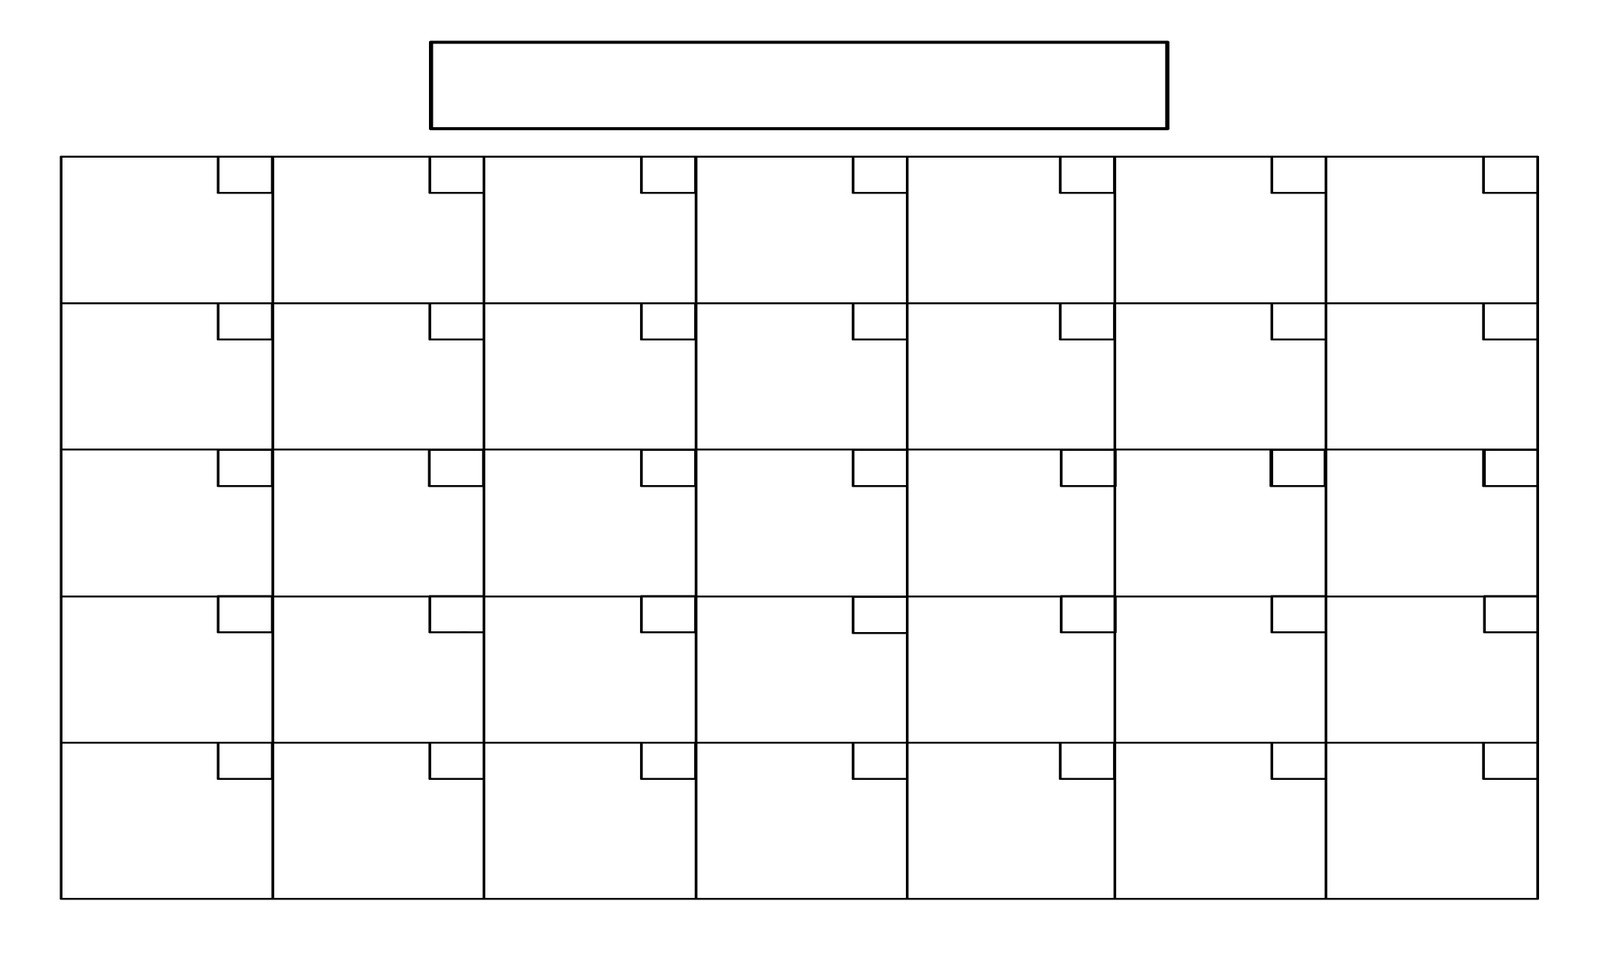 Unique Printable Full Page Calendar | Free Printable pertaining to Full Page Blank Calendar